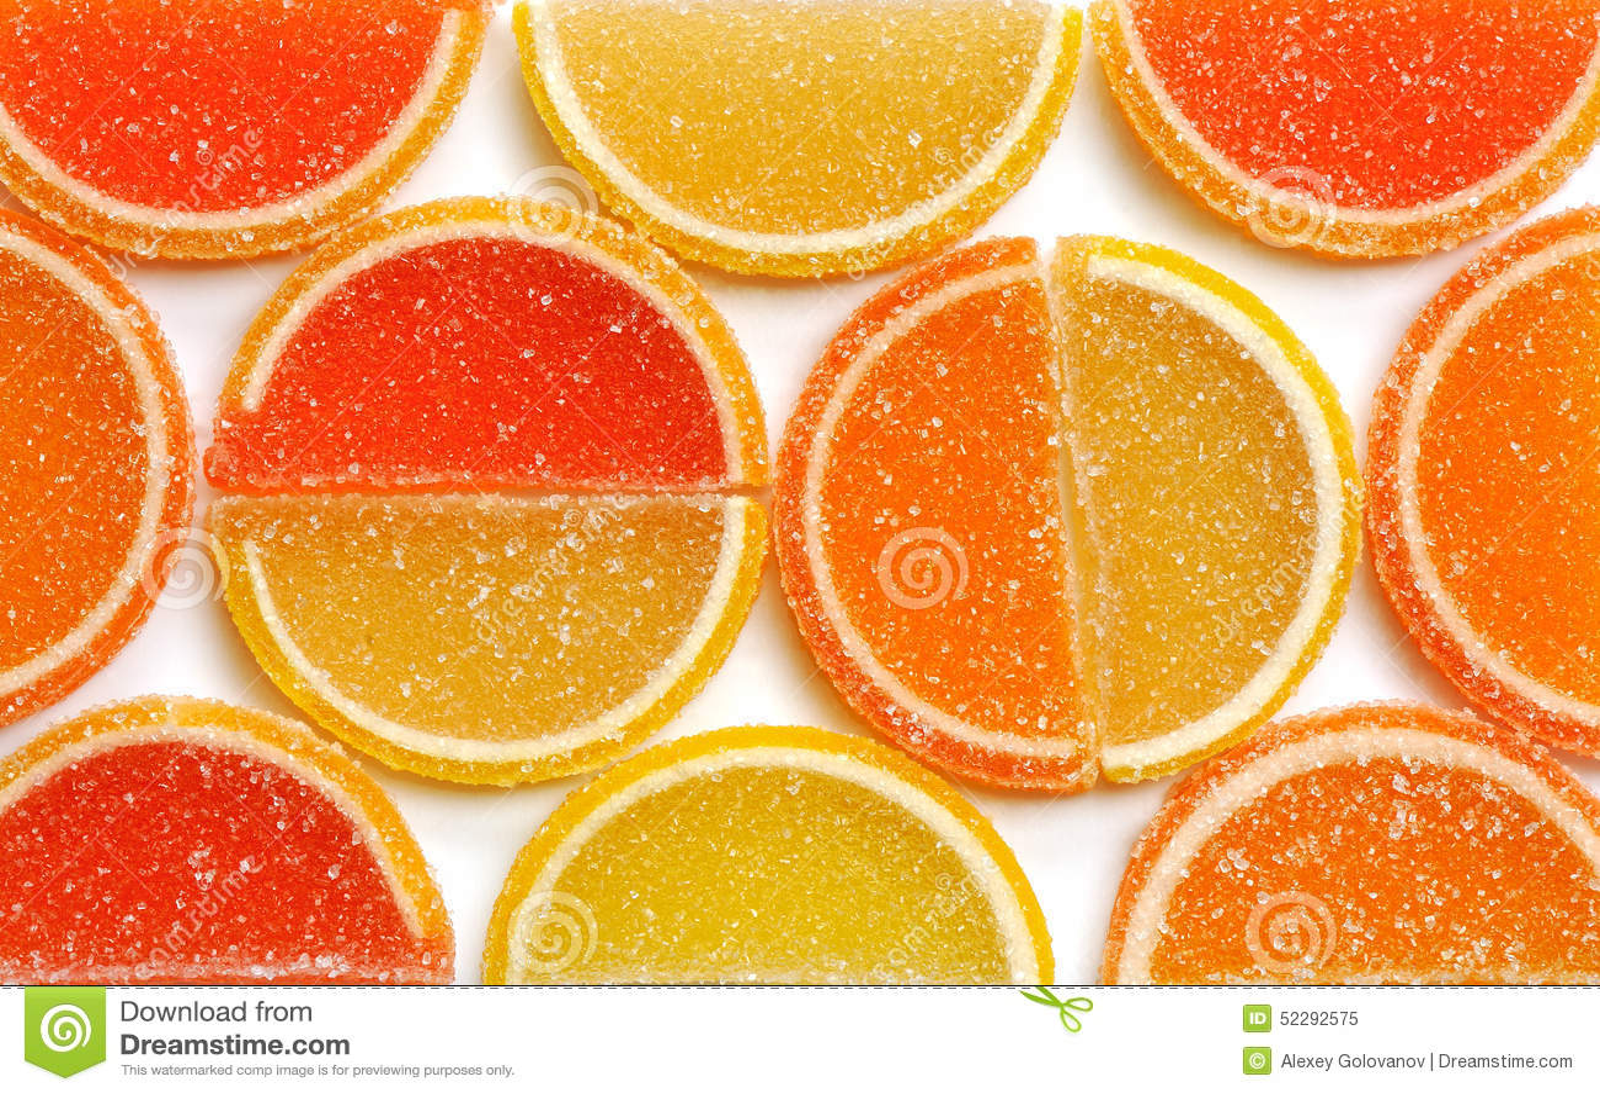 how to make orange jam at home in urdu